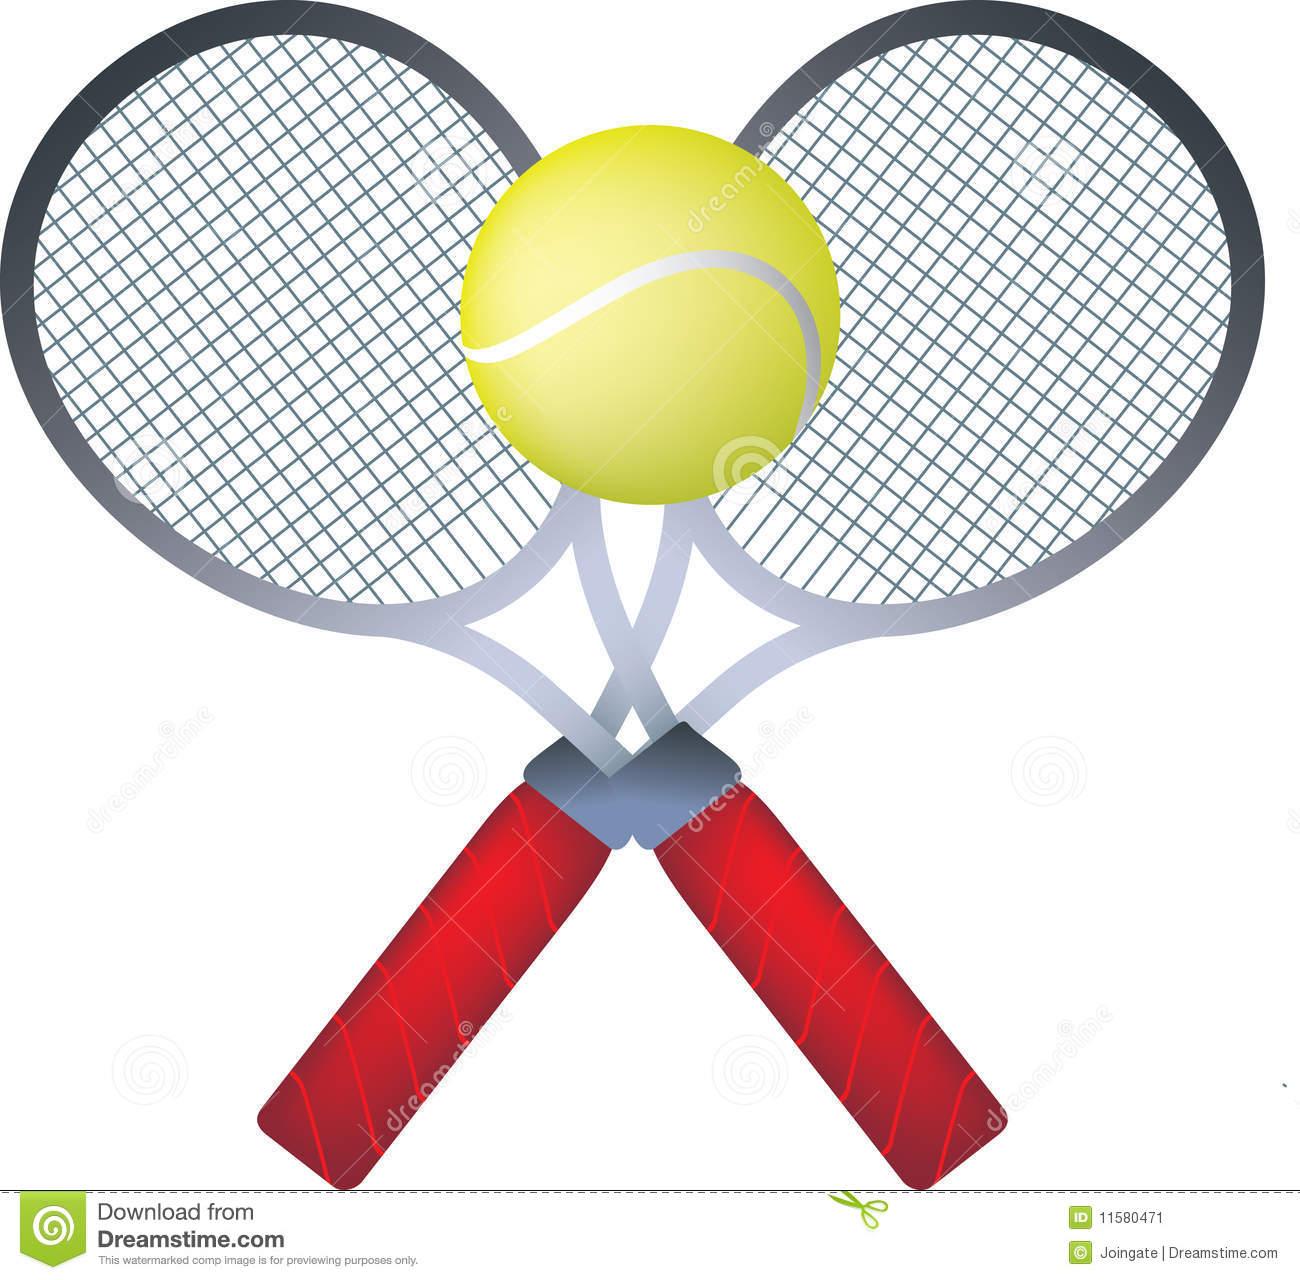 1300x1280 Tennis Rackets 11580471.jpg Clipart Panda